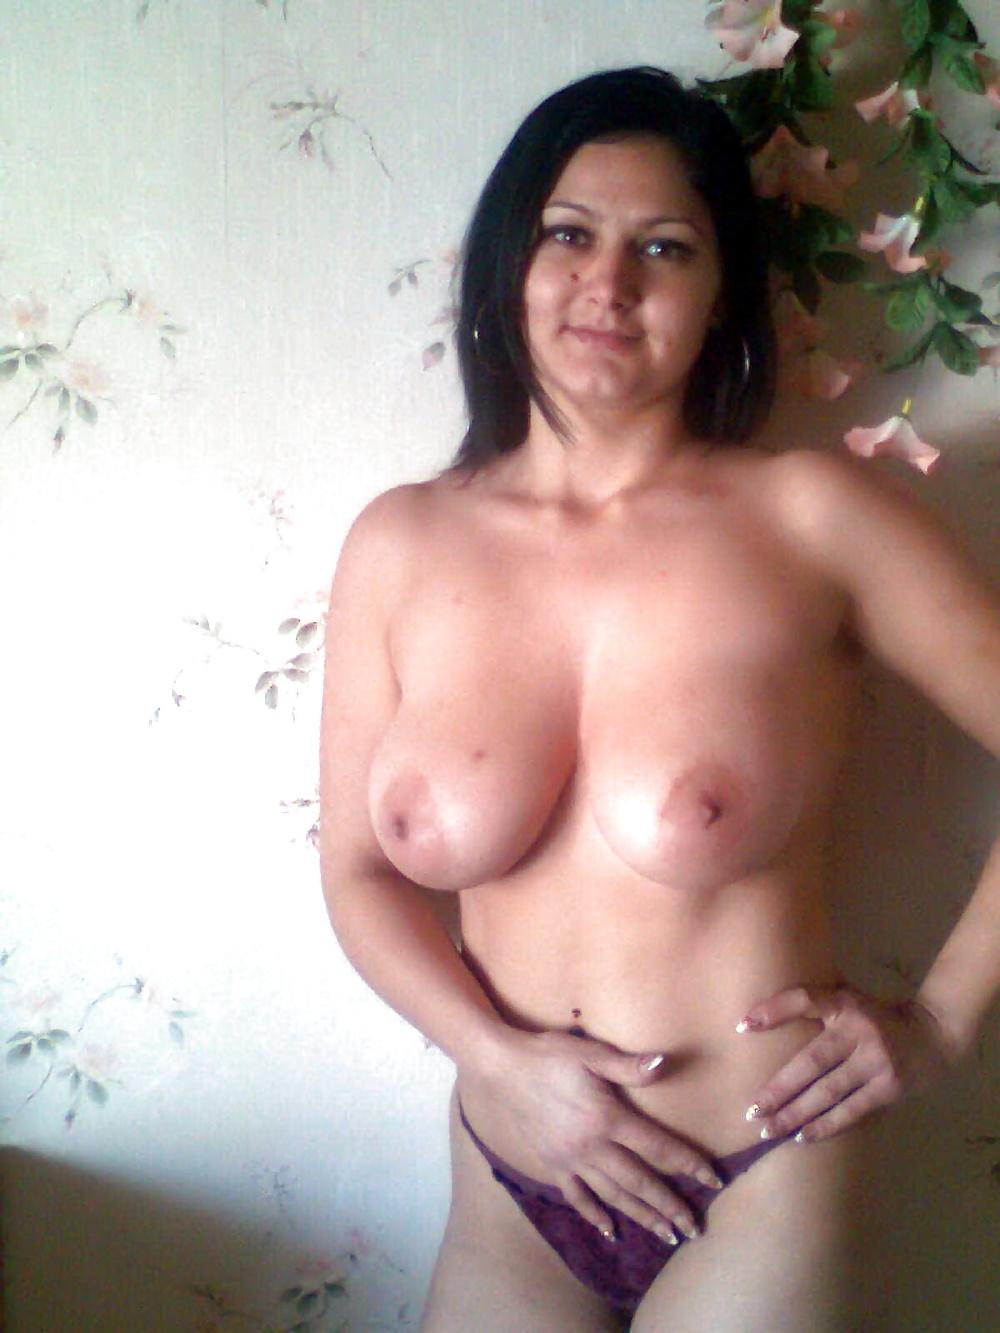 my big titty ex-girlfriend posing naked